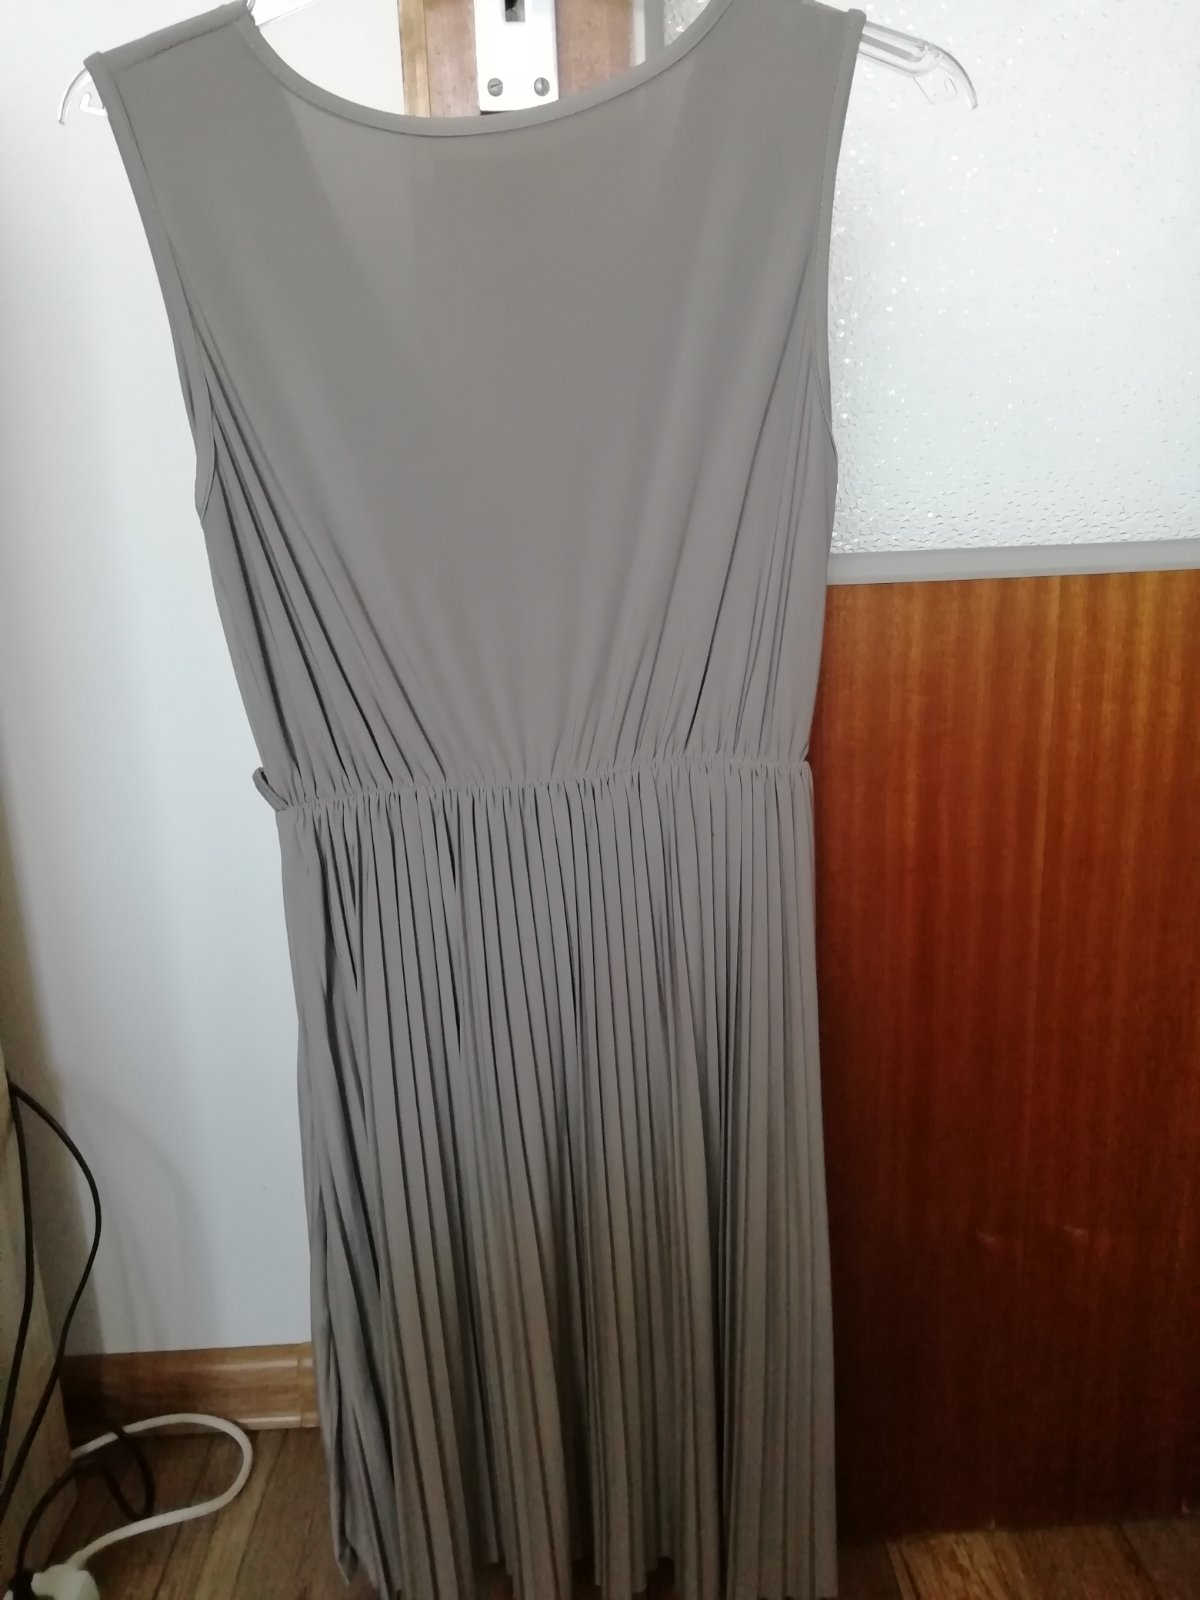 Šaty s plisovanou suknou - Obrázok č. 3